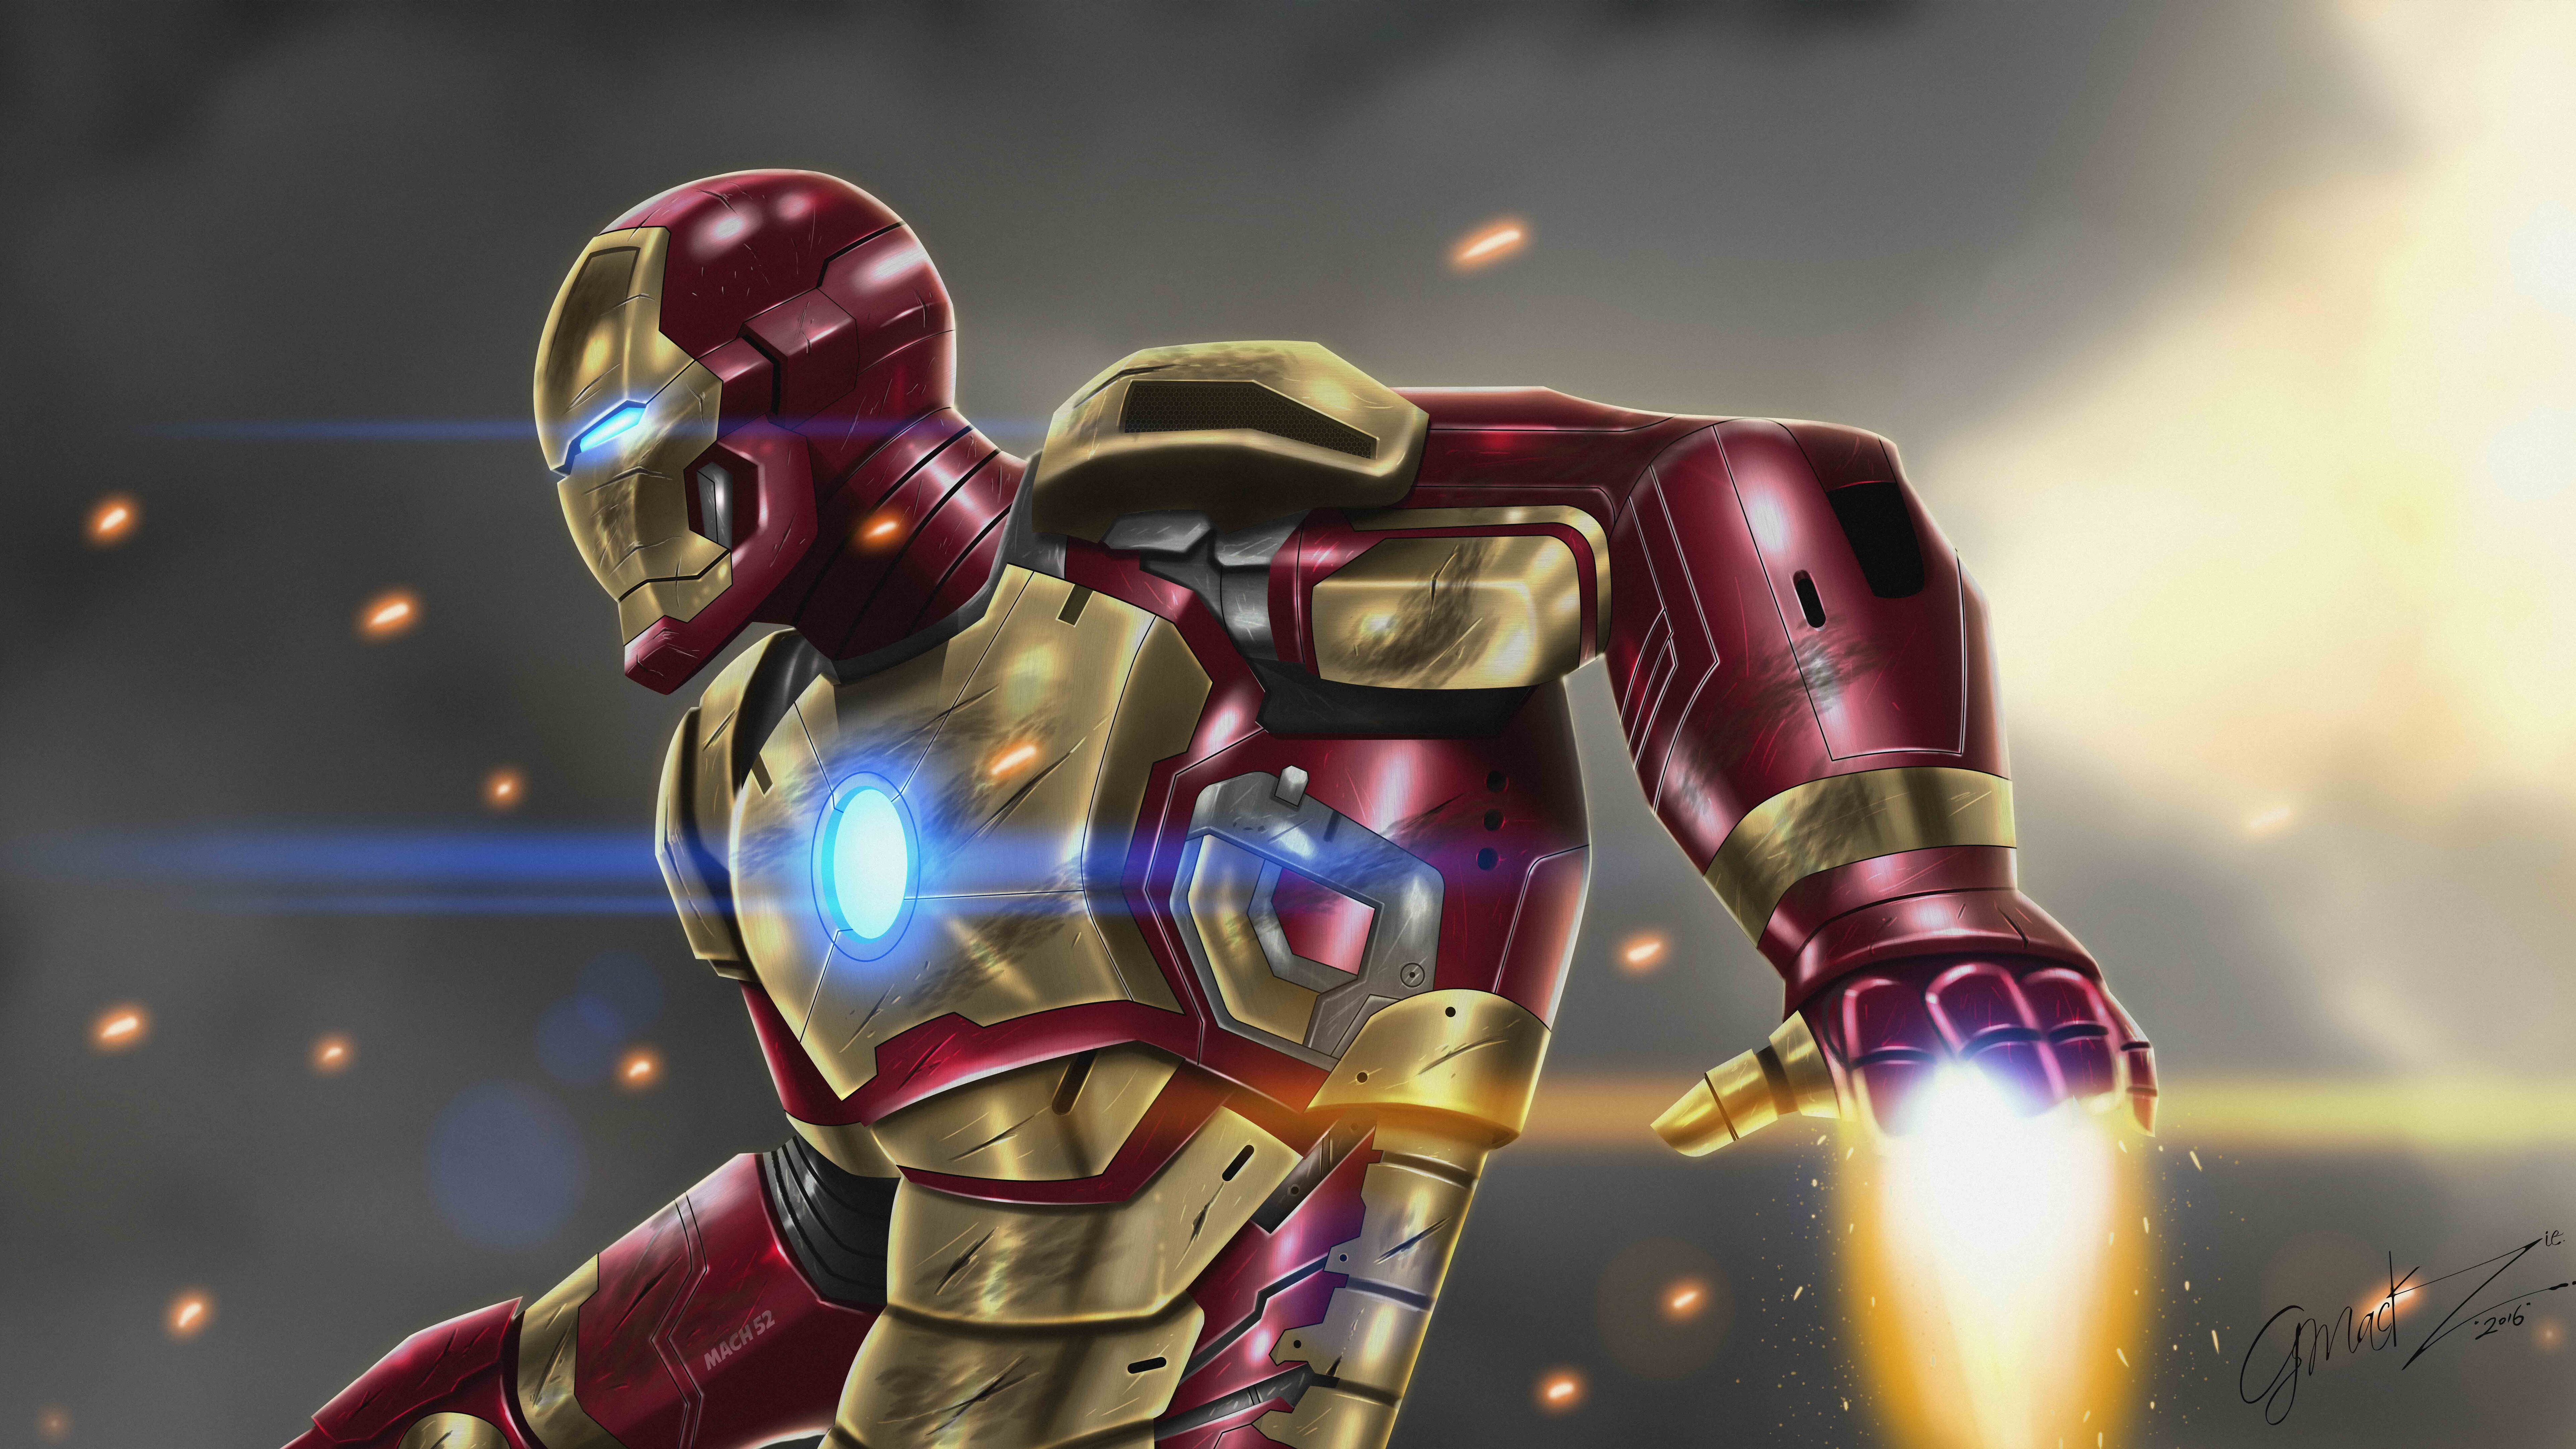 7680x4320 Iron Man At War 10k Artwork 8k Hd 4k Wallpapers Images